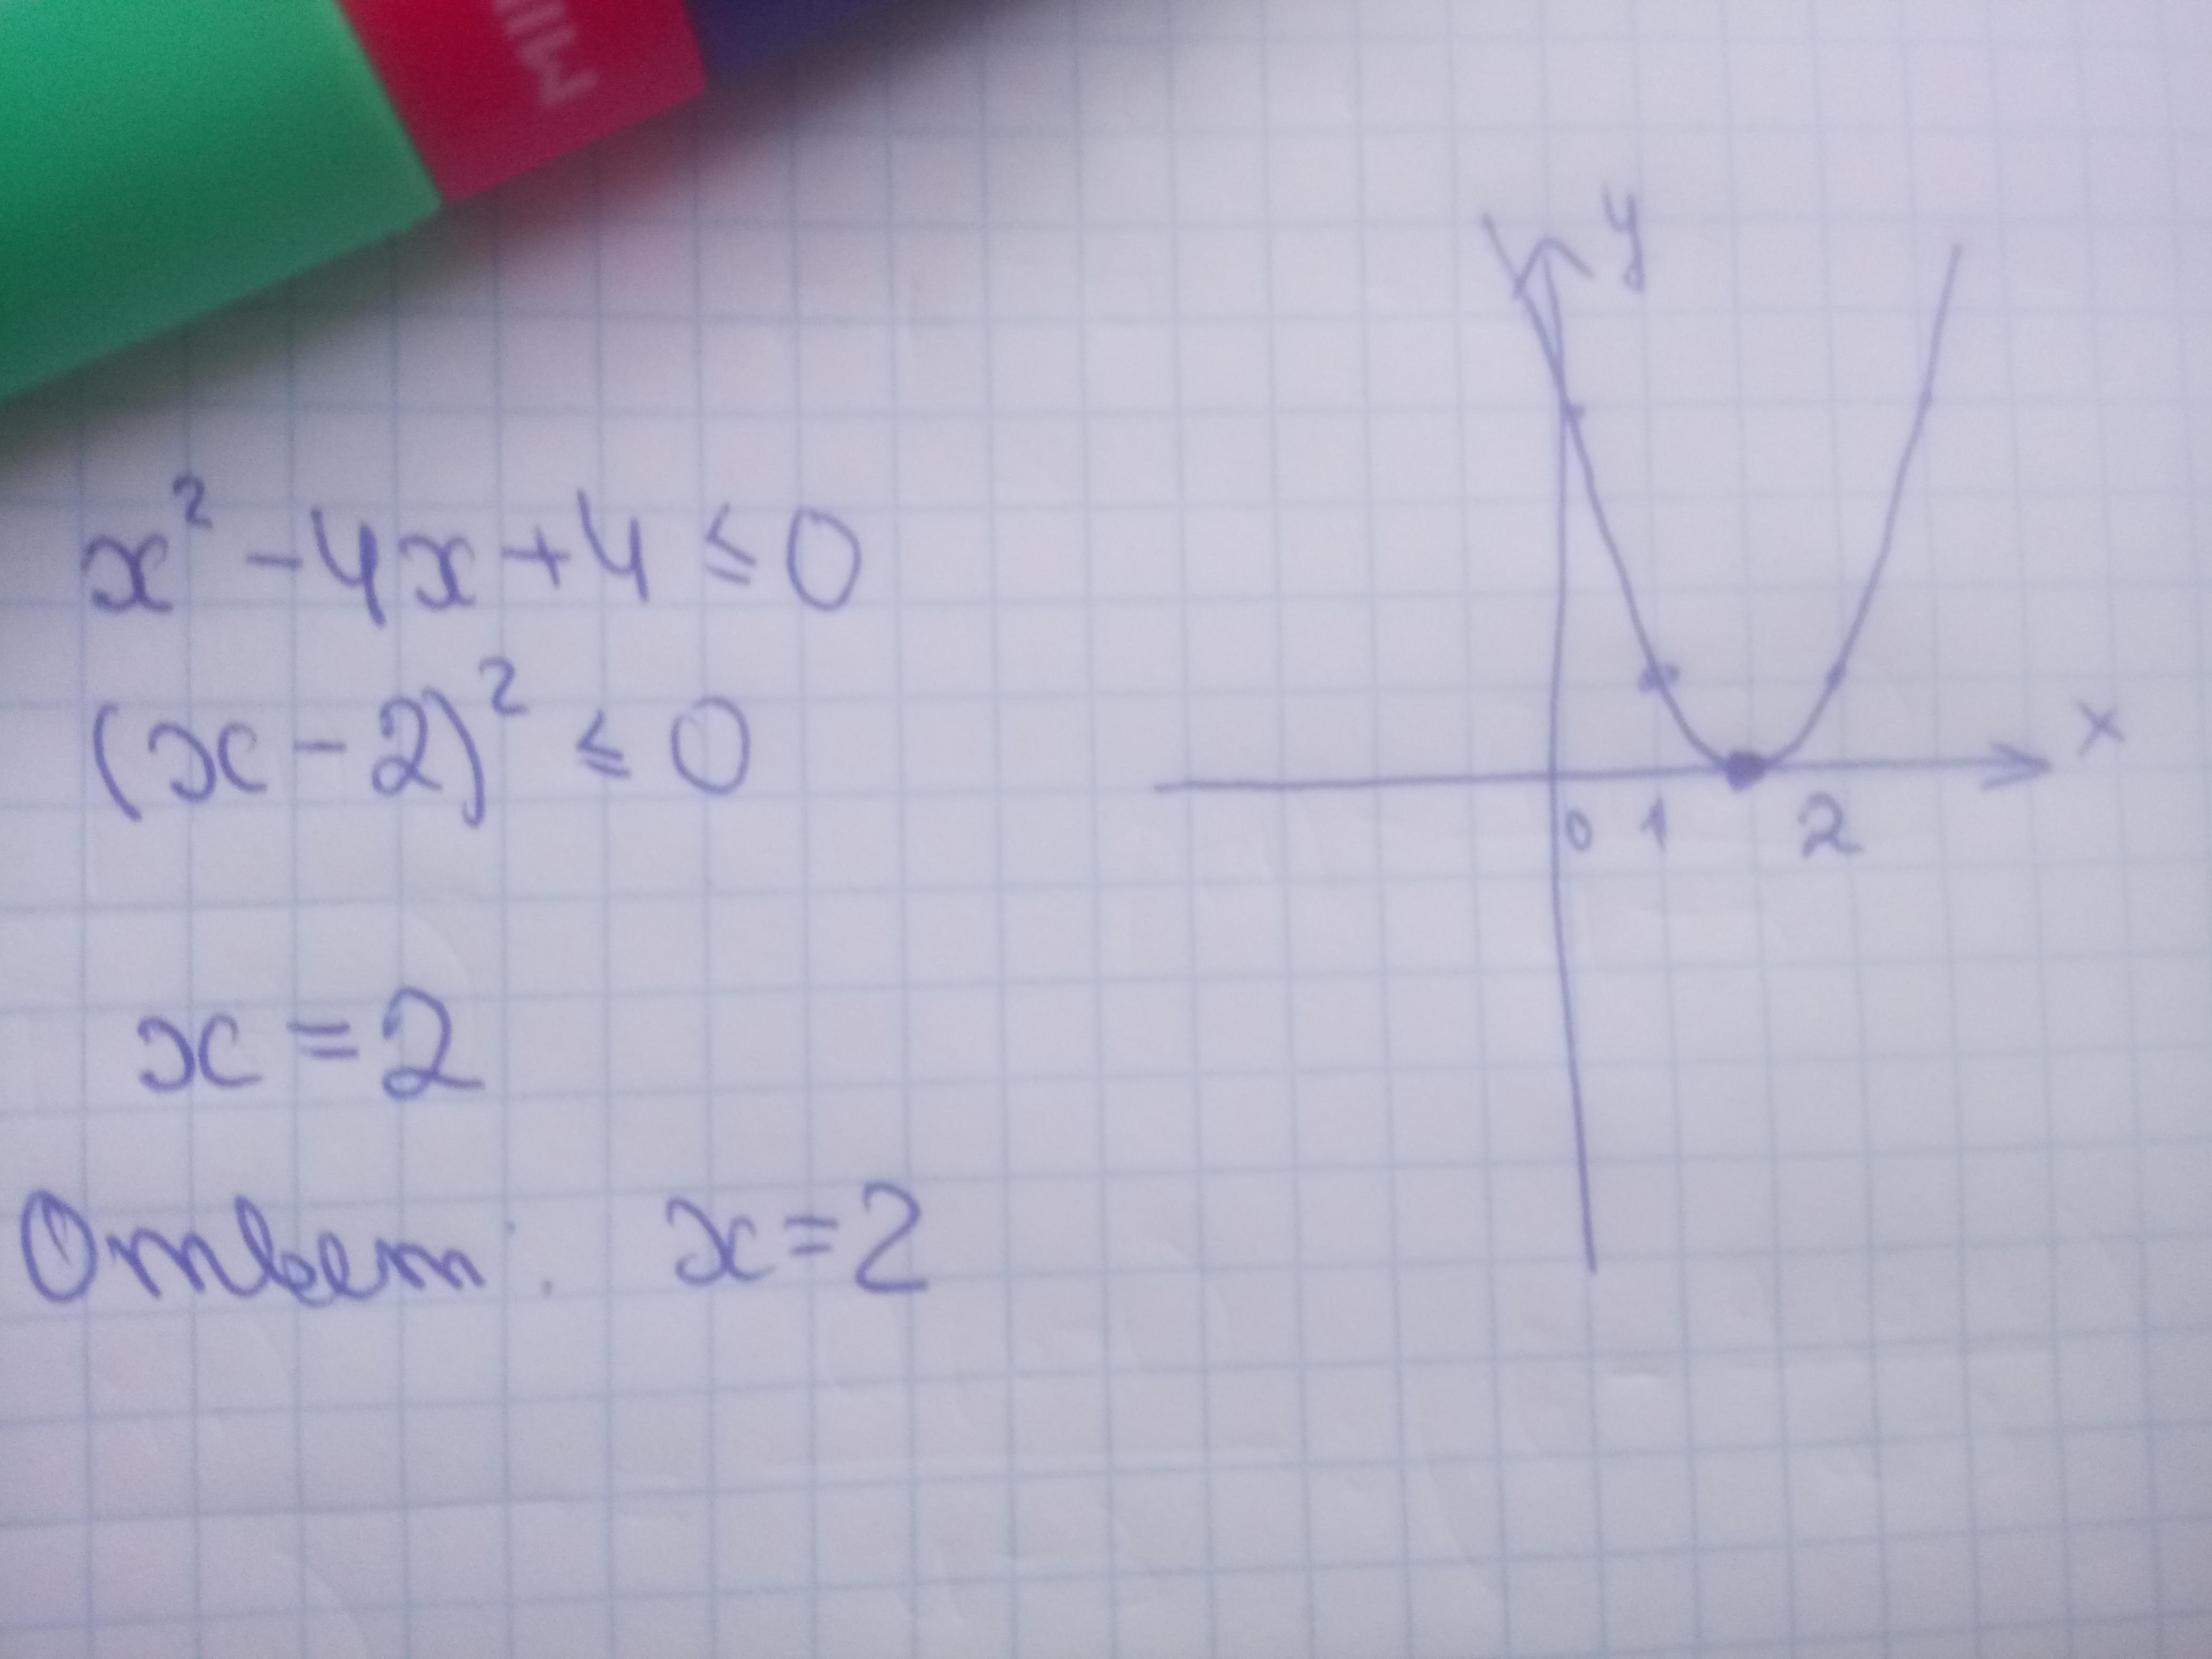 X²-4x+4≤0 Помогите пожалуйста!!!